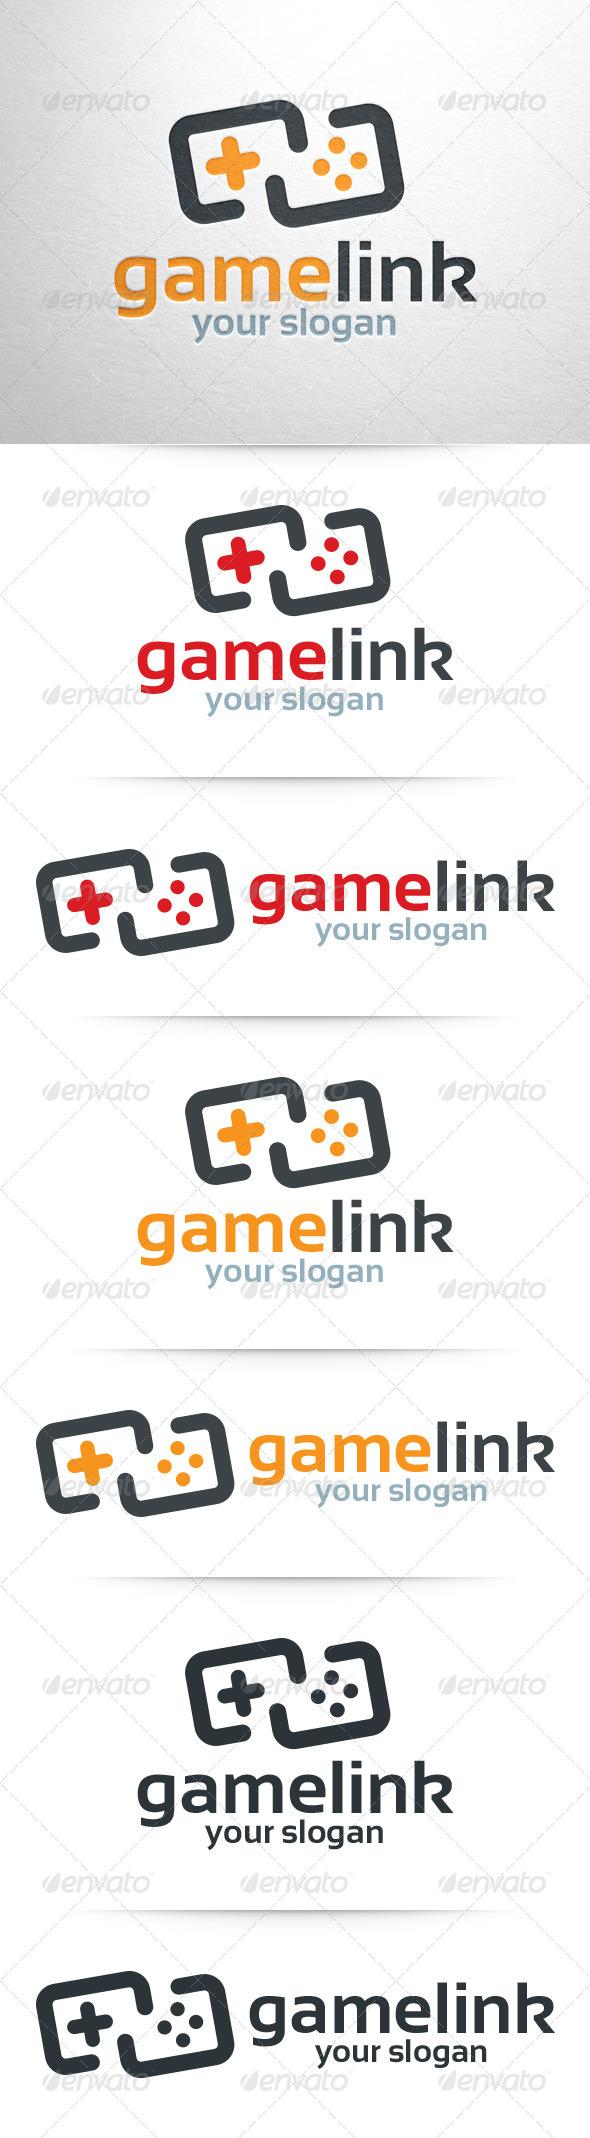 GraphicRiver Game Link Logo Template 7530259